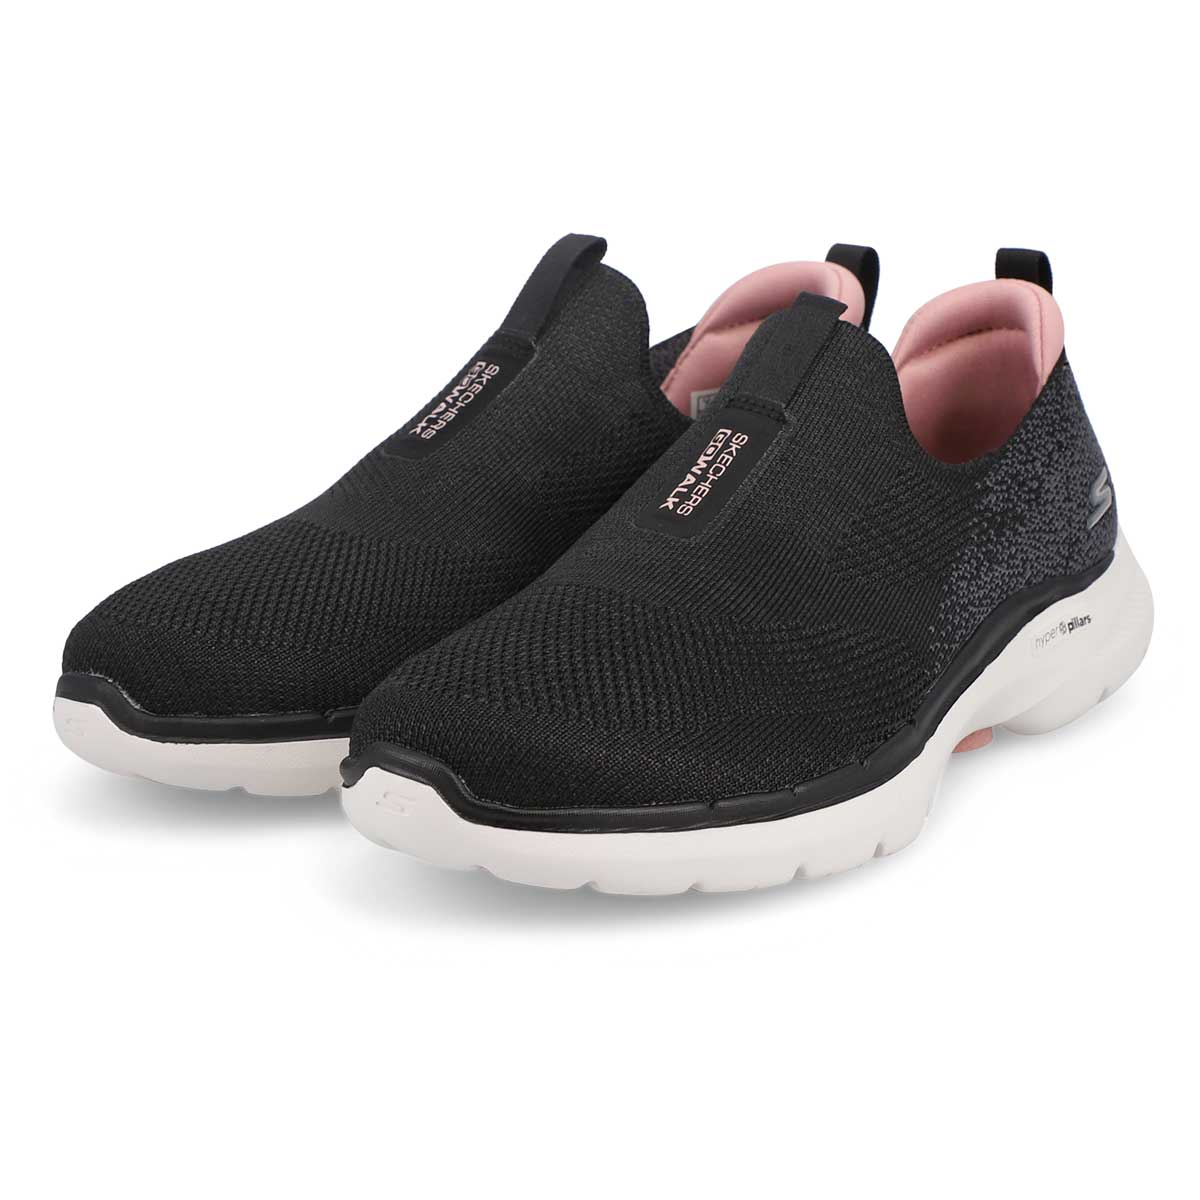 Women's Go Walk 6 Slip On Shoe - Black/Pink